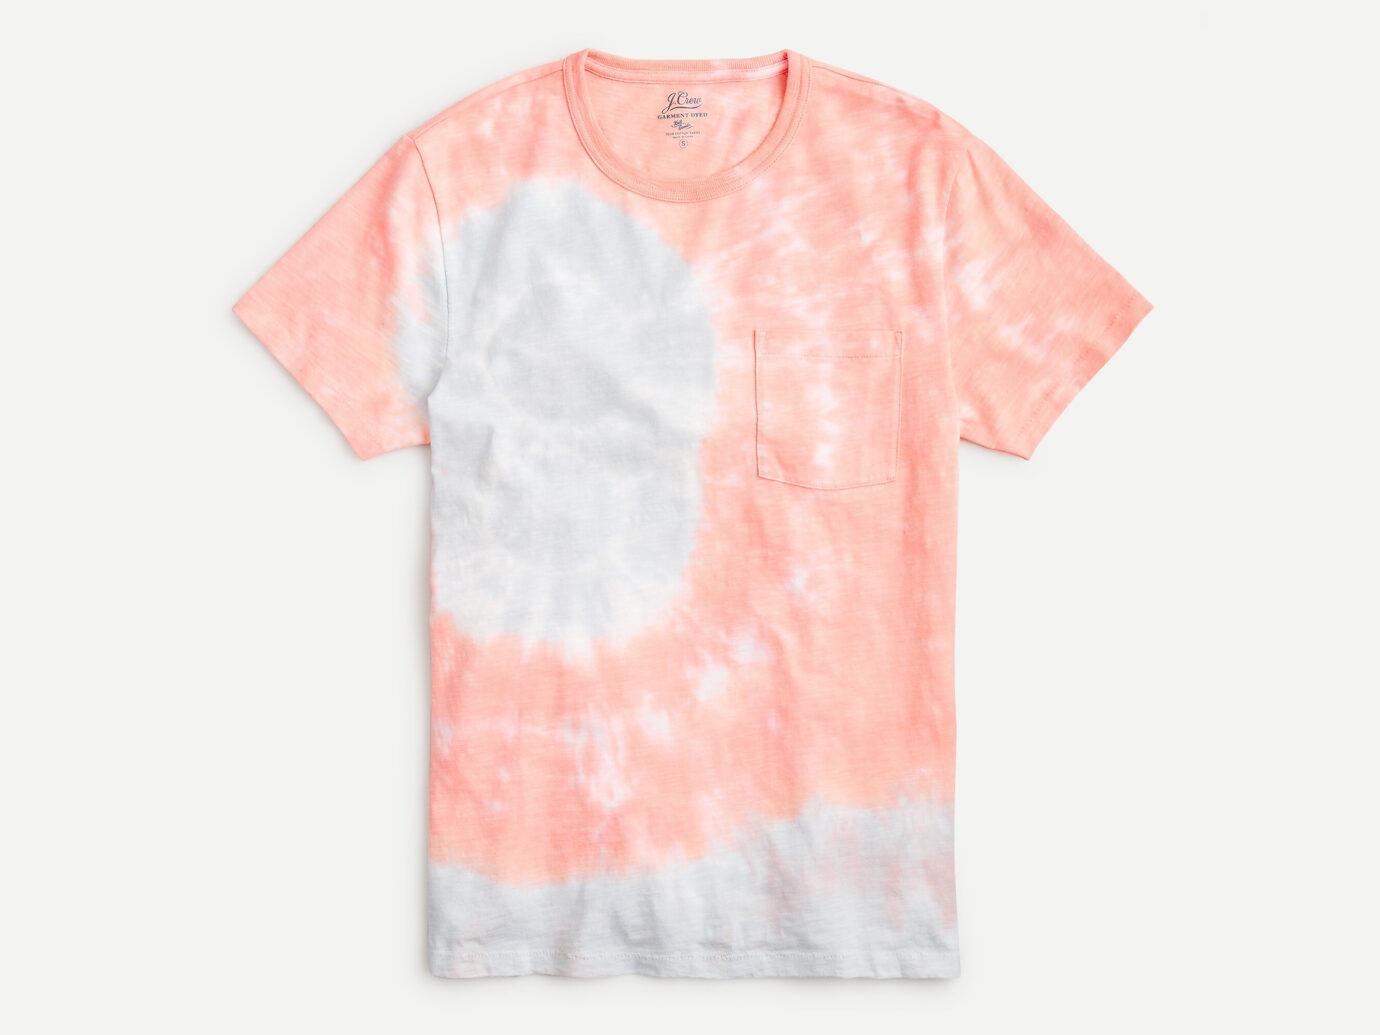 J.Crew Slub cotton crewneck T-shirt in tie-dyed coral swirl